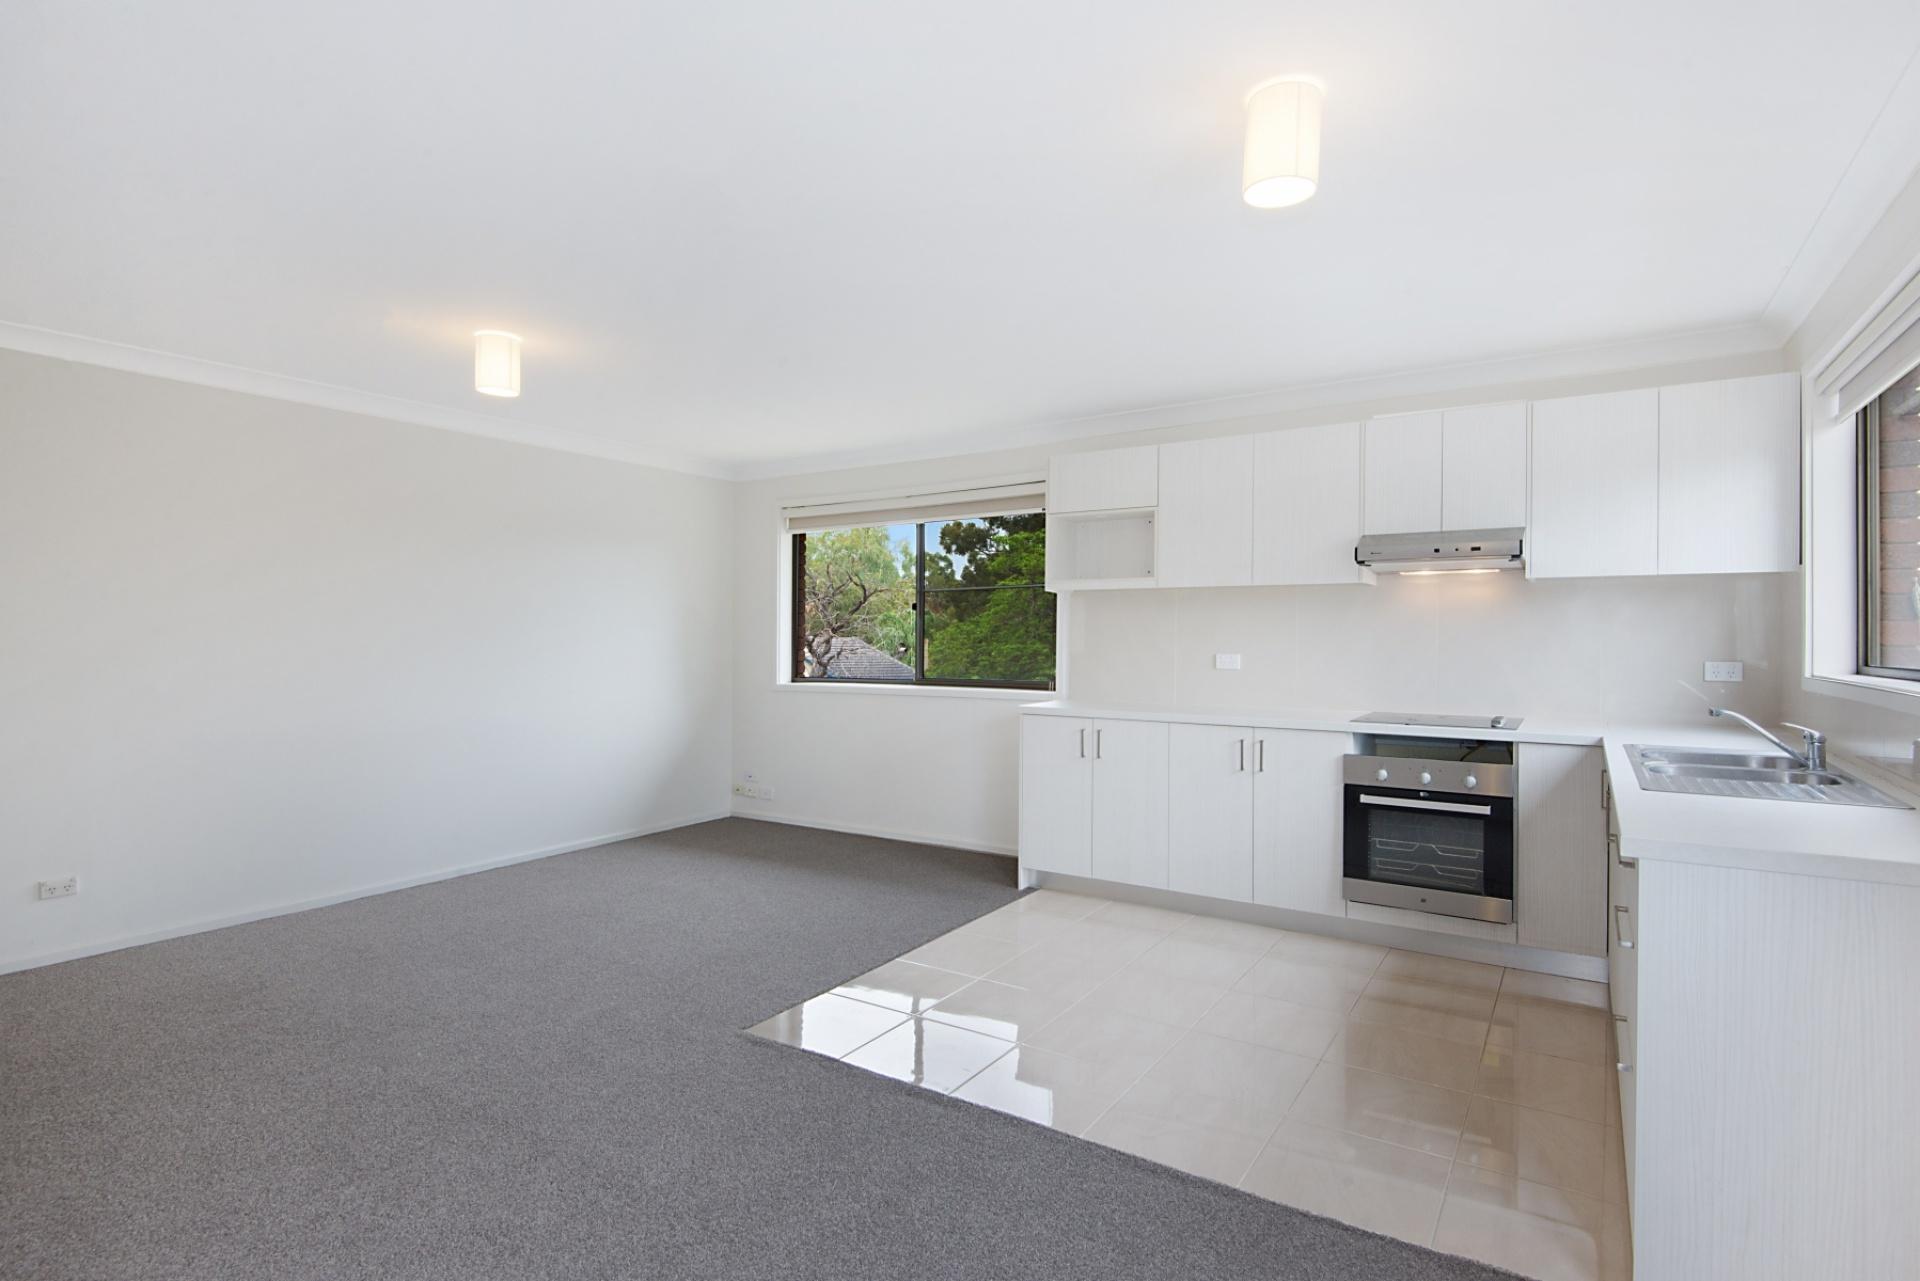 2 Bedrooms, Apartment, Leased, Bracken Fell Close, 1 Bathrooms, Listing ID 1390, Castle Hill , NSW, Australia, 2154,